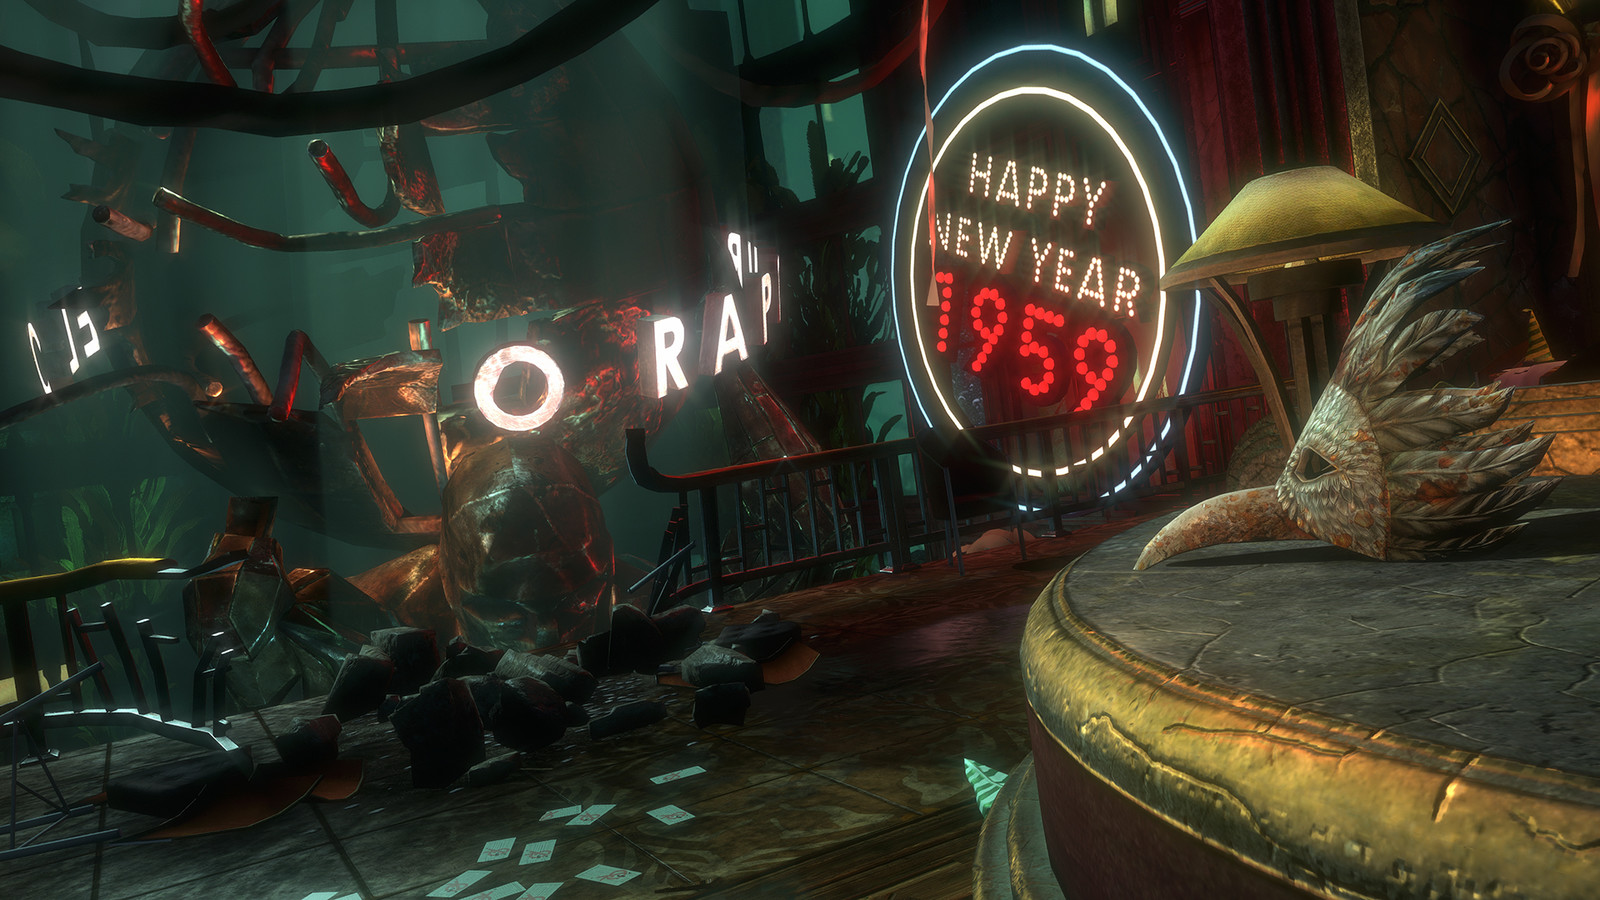 BioShock Remastered (Irrational - Blind Squirrel Games)